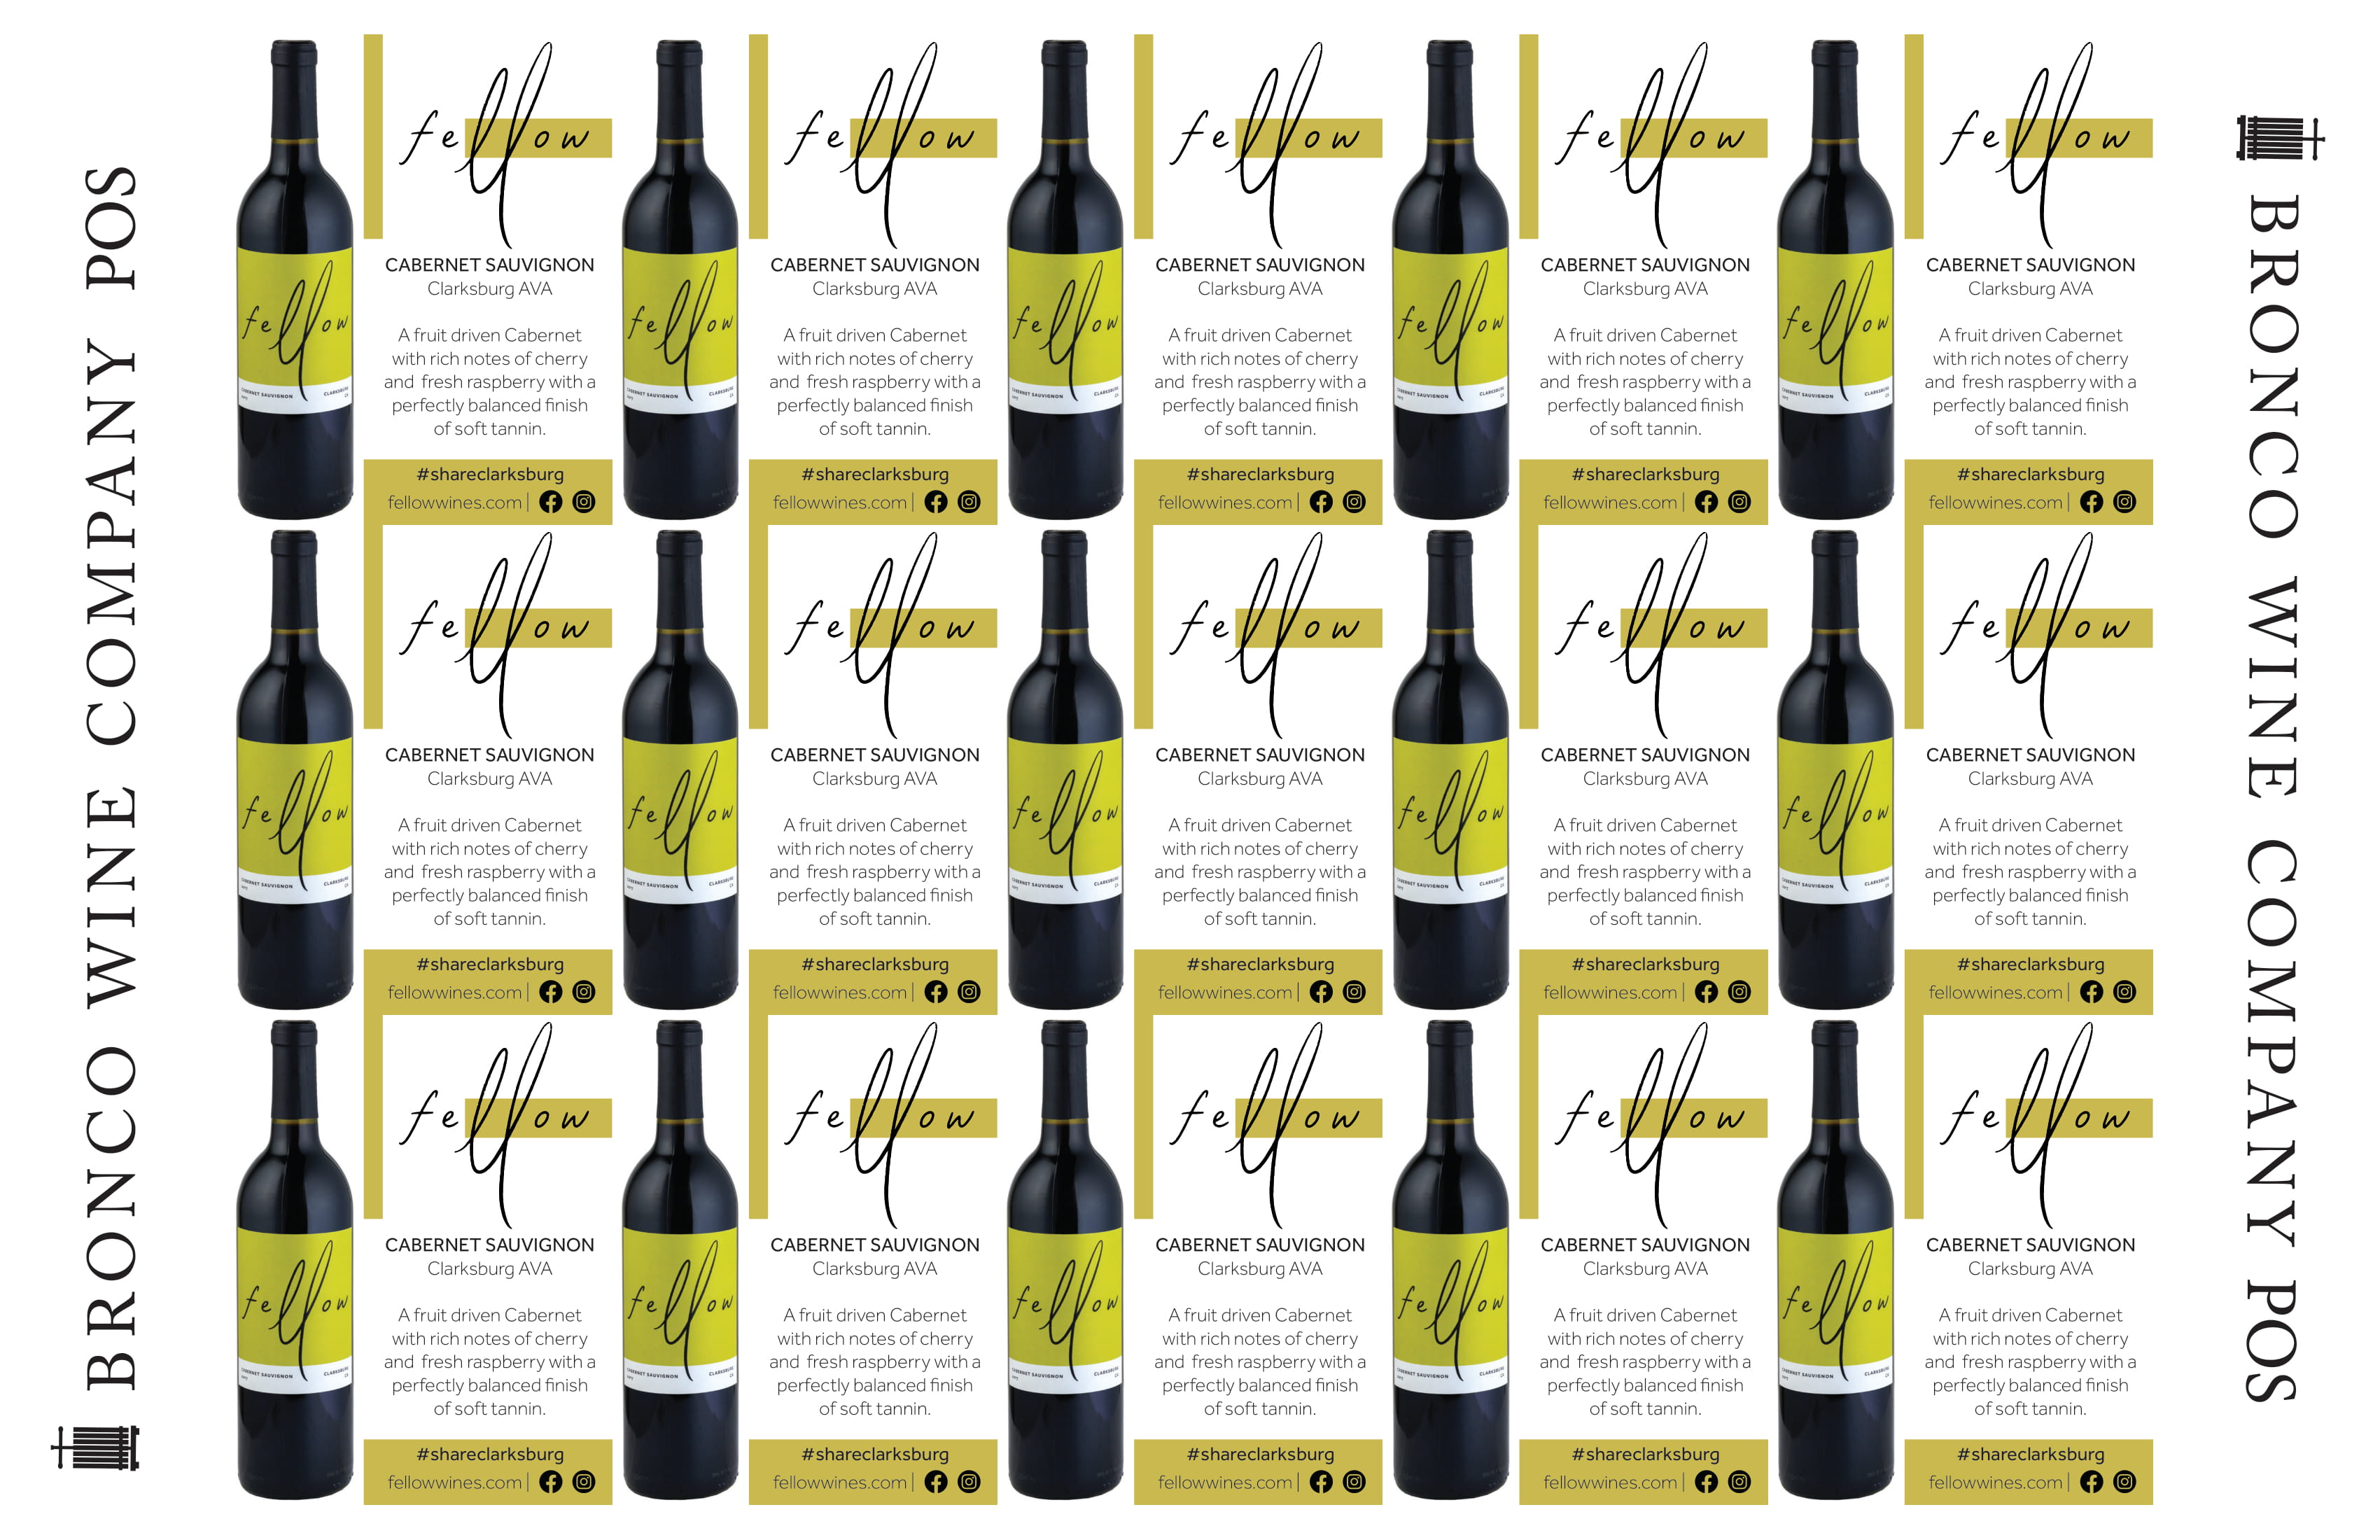 Fellow Wines Cabernet Sauvignon Shelf Talker